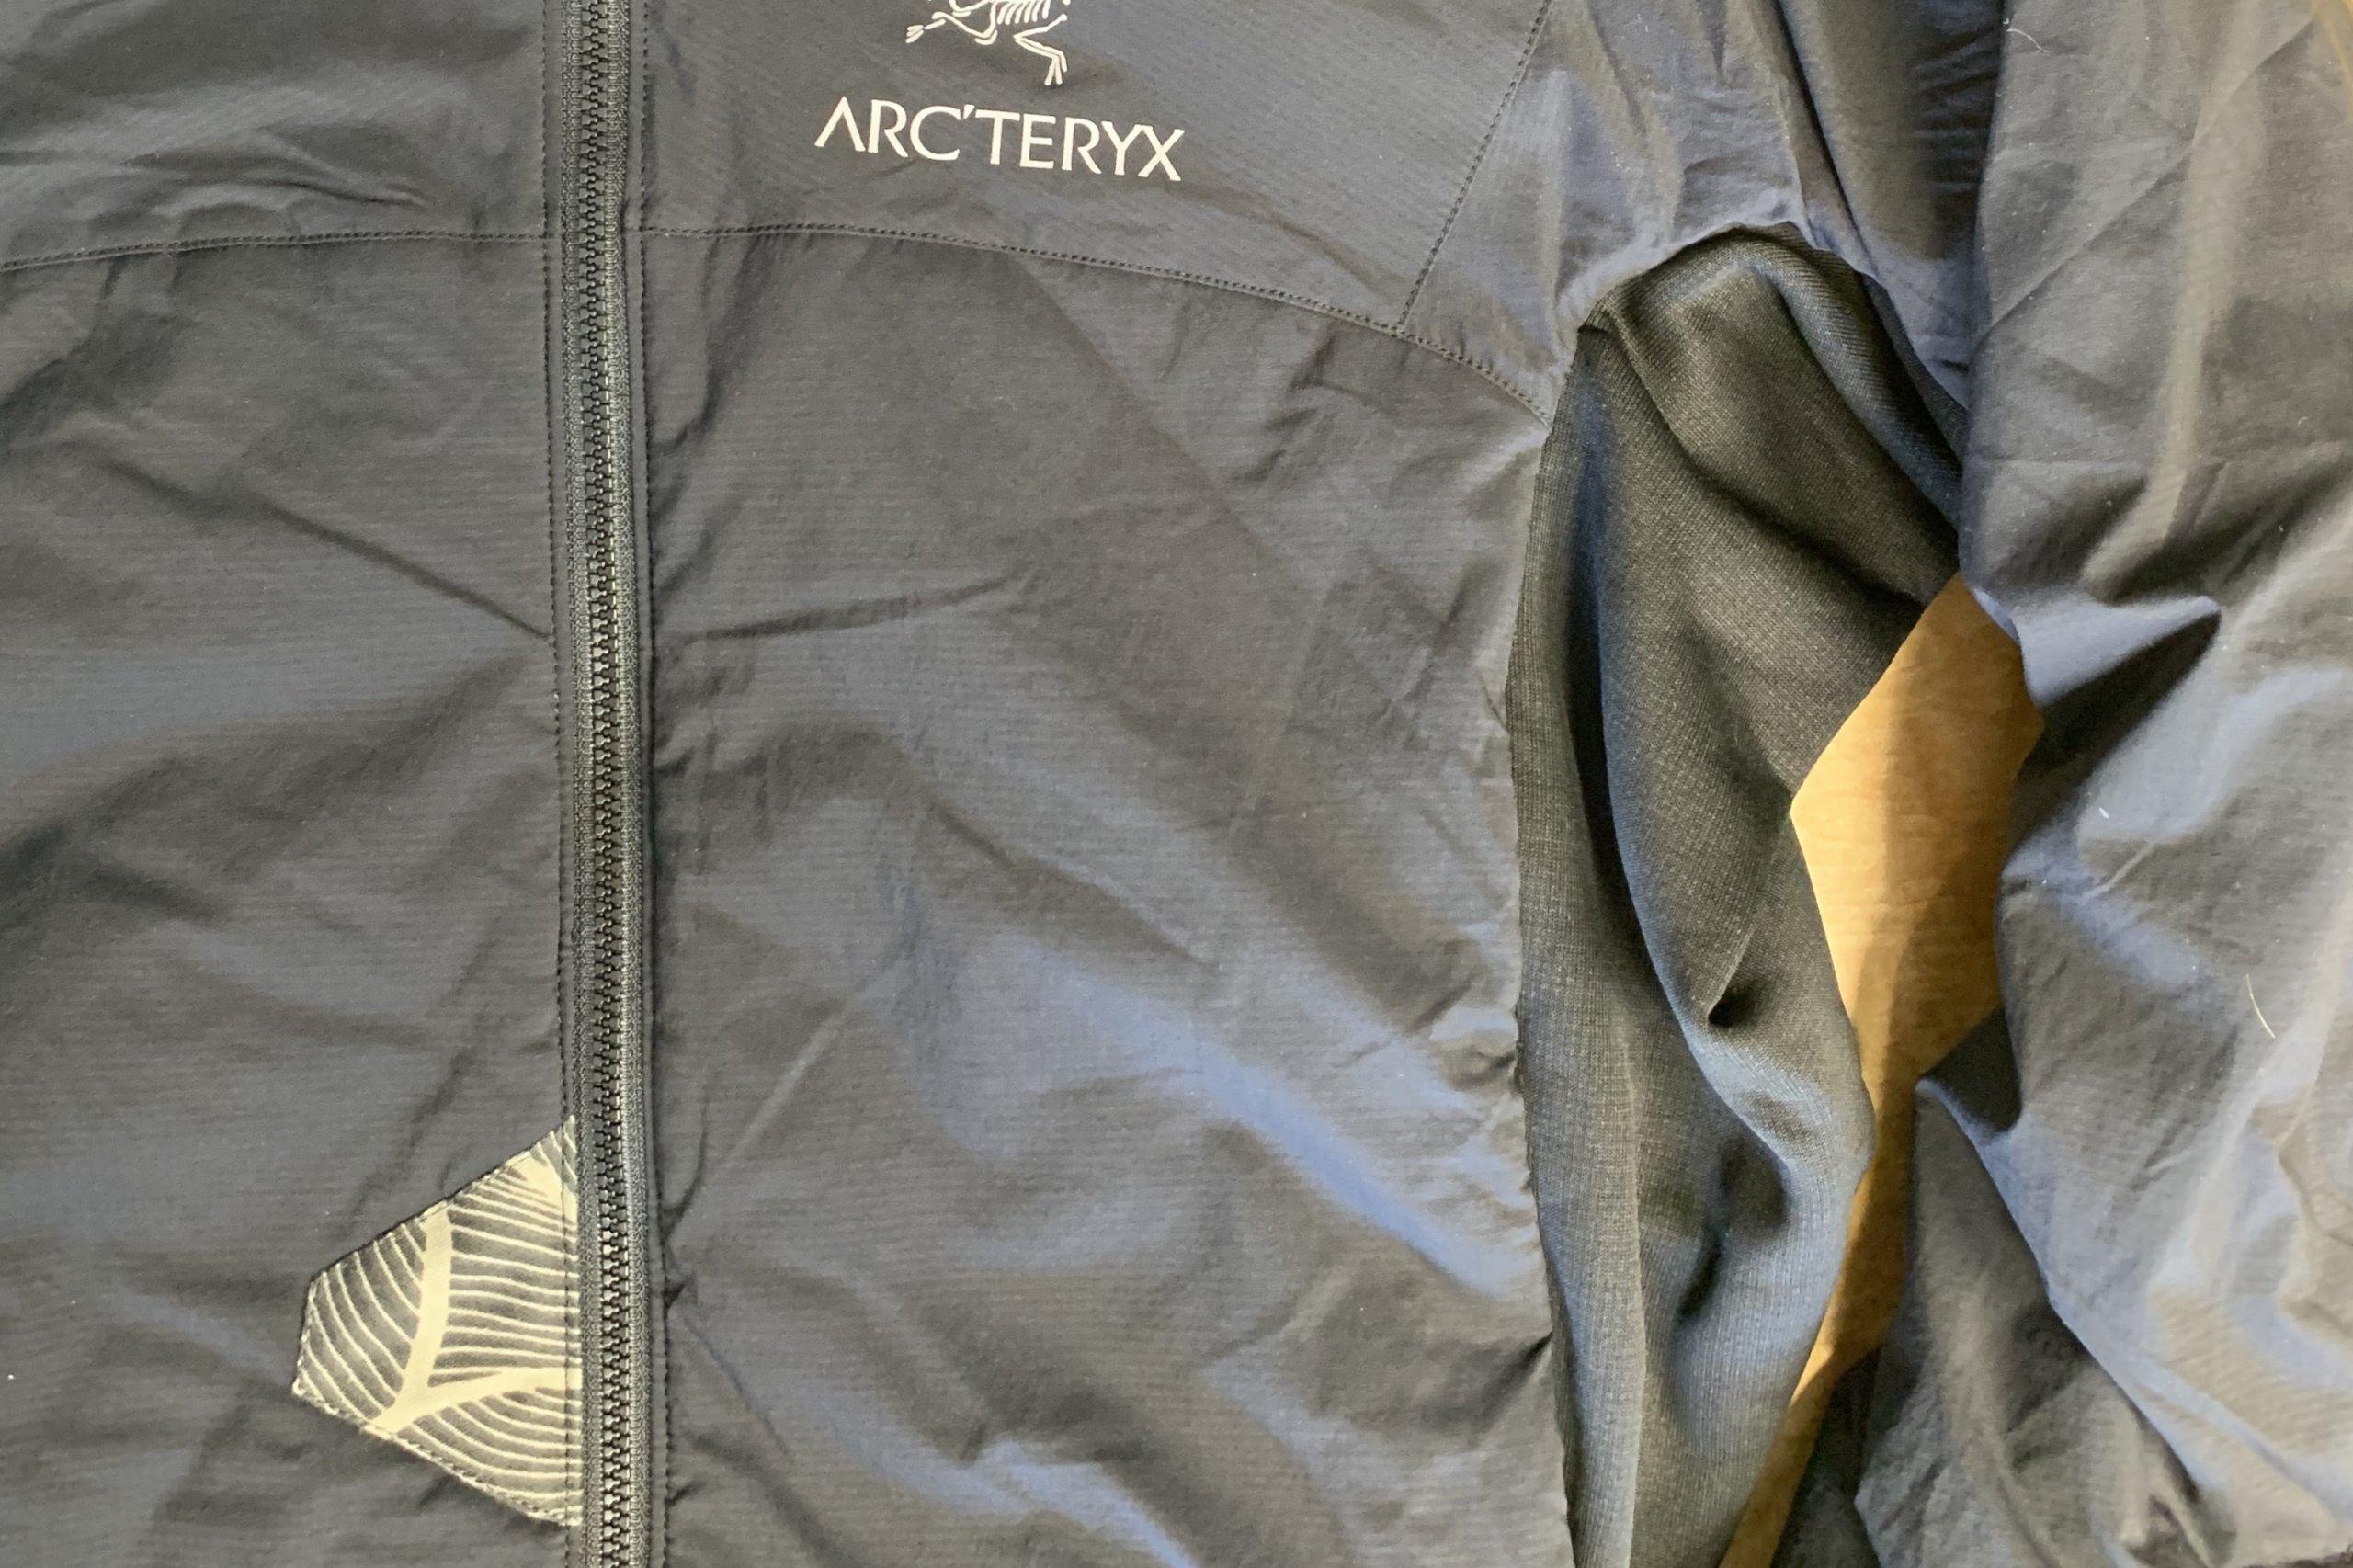 arcyteryx patching